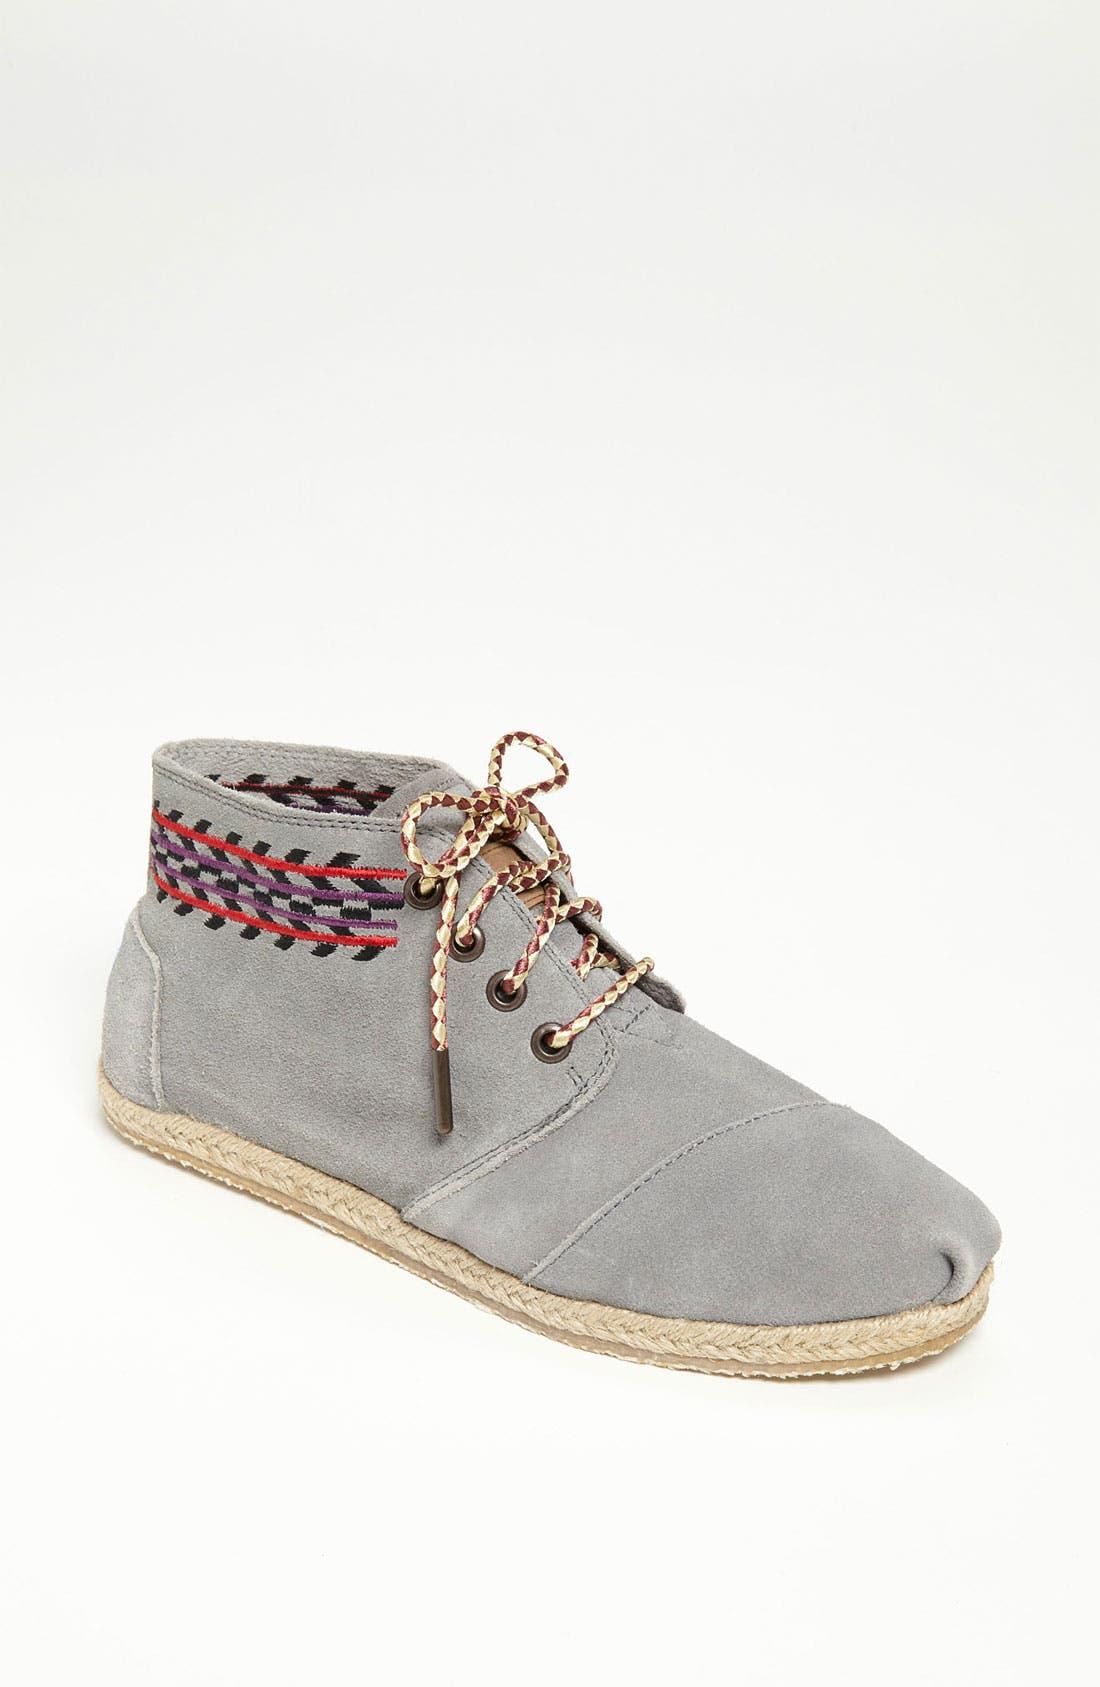 Alternate Image 1 Selected - TOMS 'Botas Desert - Alarco' Chukka Boot (Women)